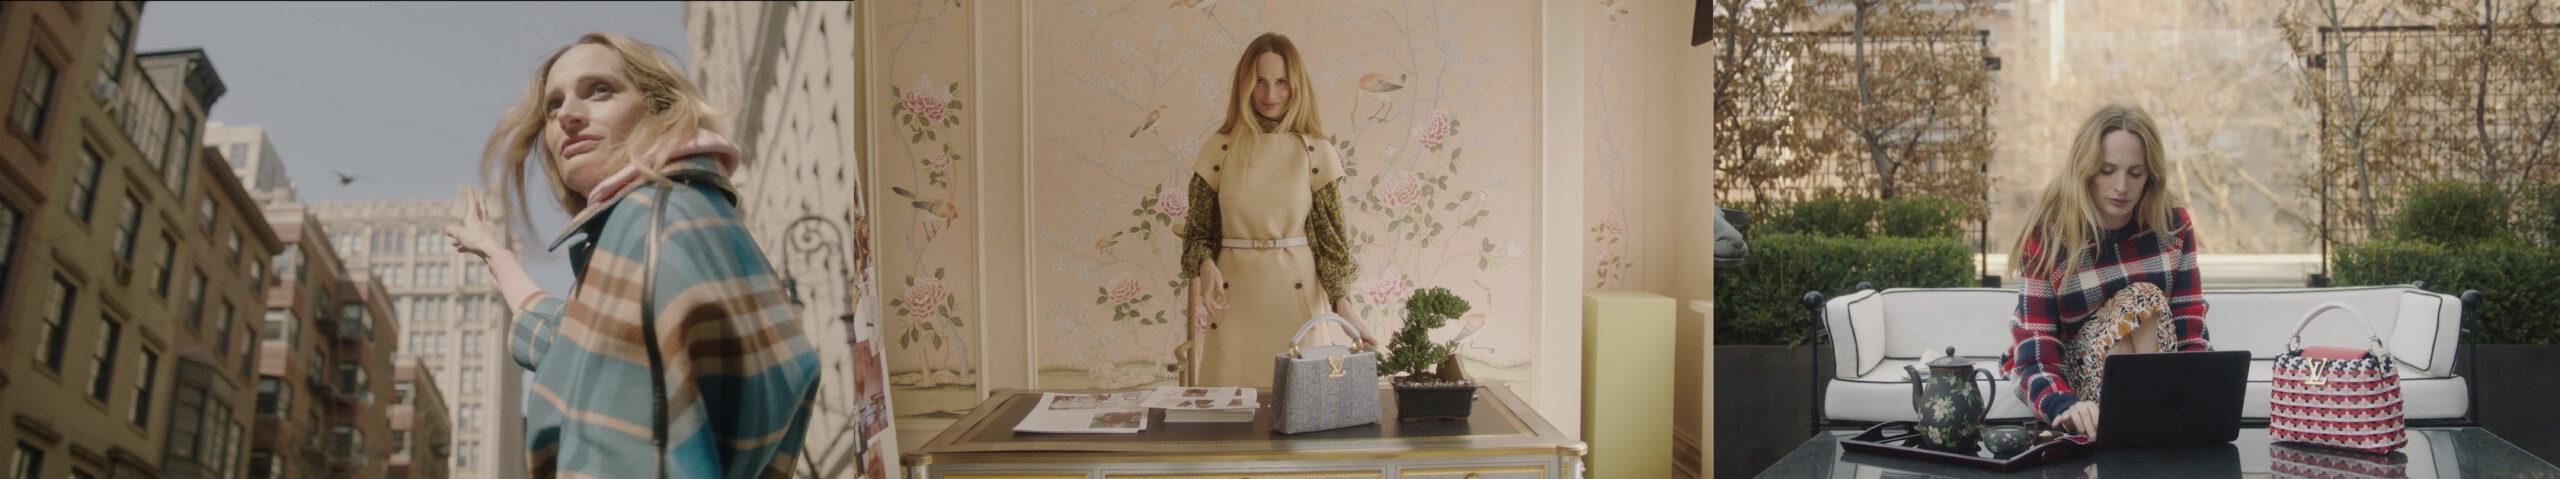 Louis-Vuitton-x-LSD-Igor-Kropotov-Director-of-Photography